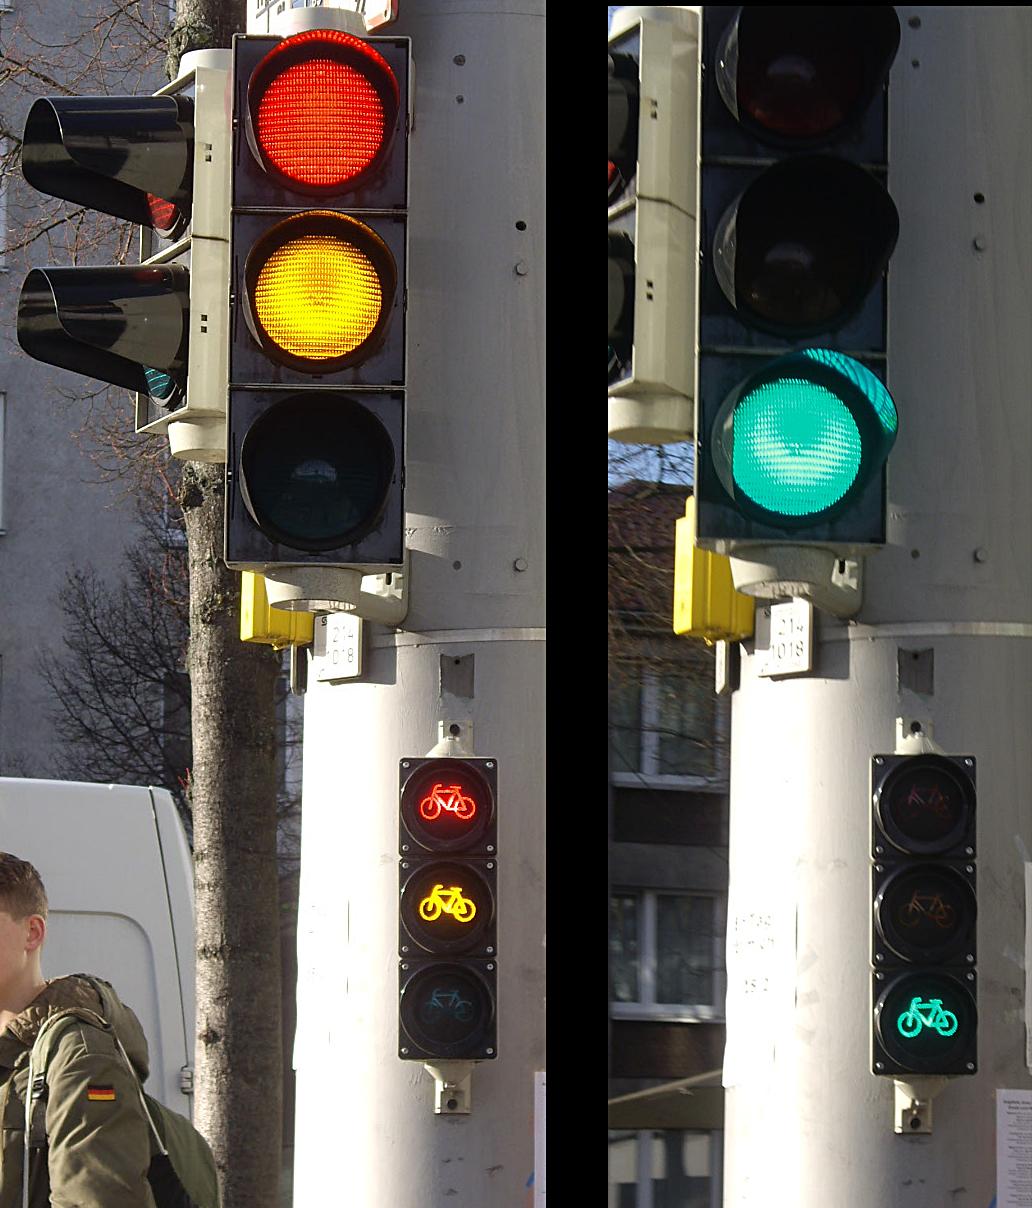 Traffic Light Sequence >> Traffic light coalition - Wikipedia